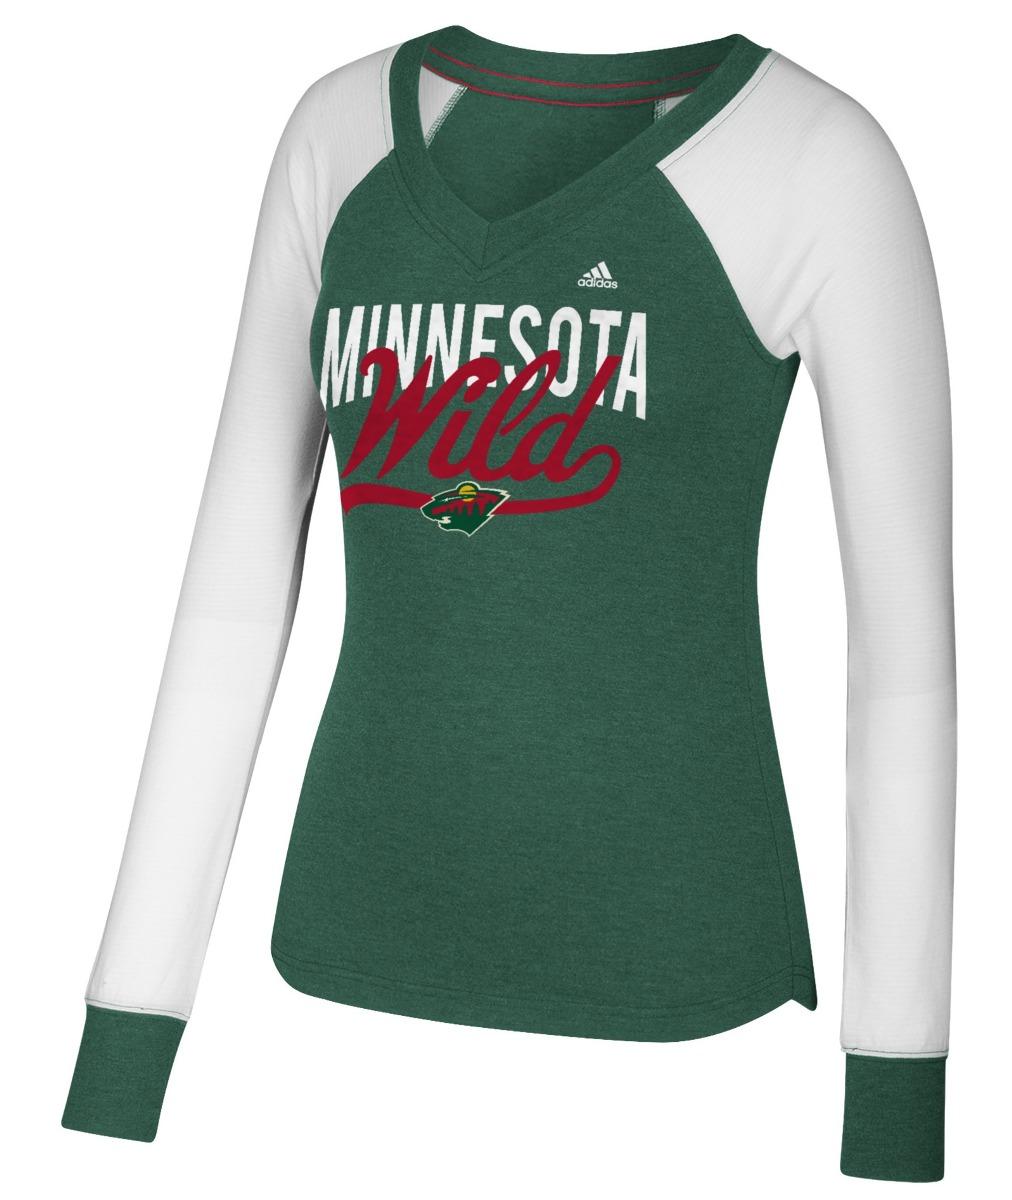 "Minnesota Wild Women's Adidas NHL ""Puck Drop"" Dual Blend Long Sleeve T-shirt by Adidas"